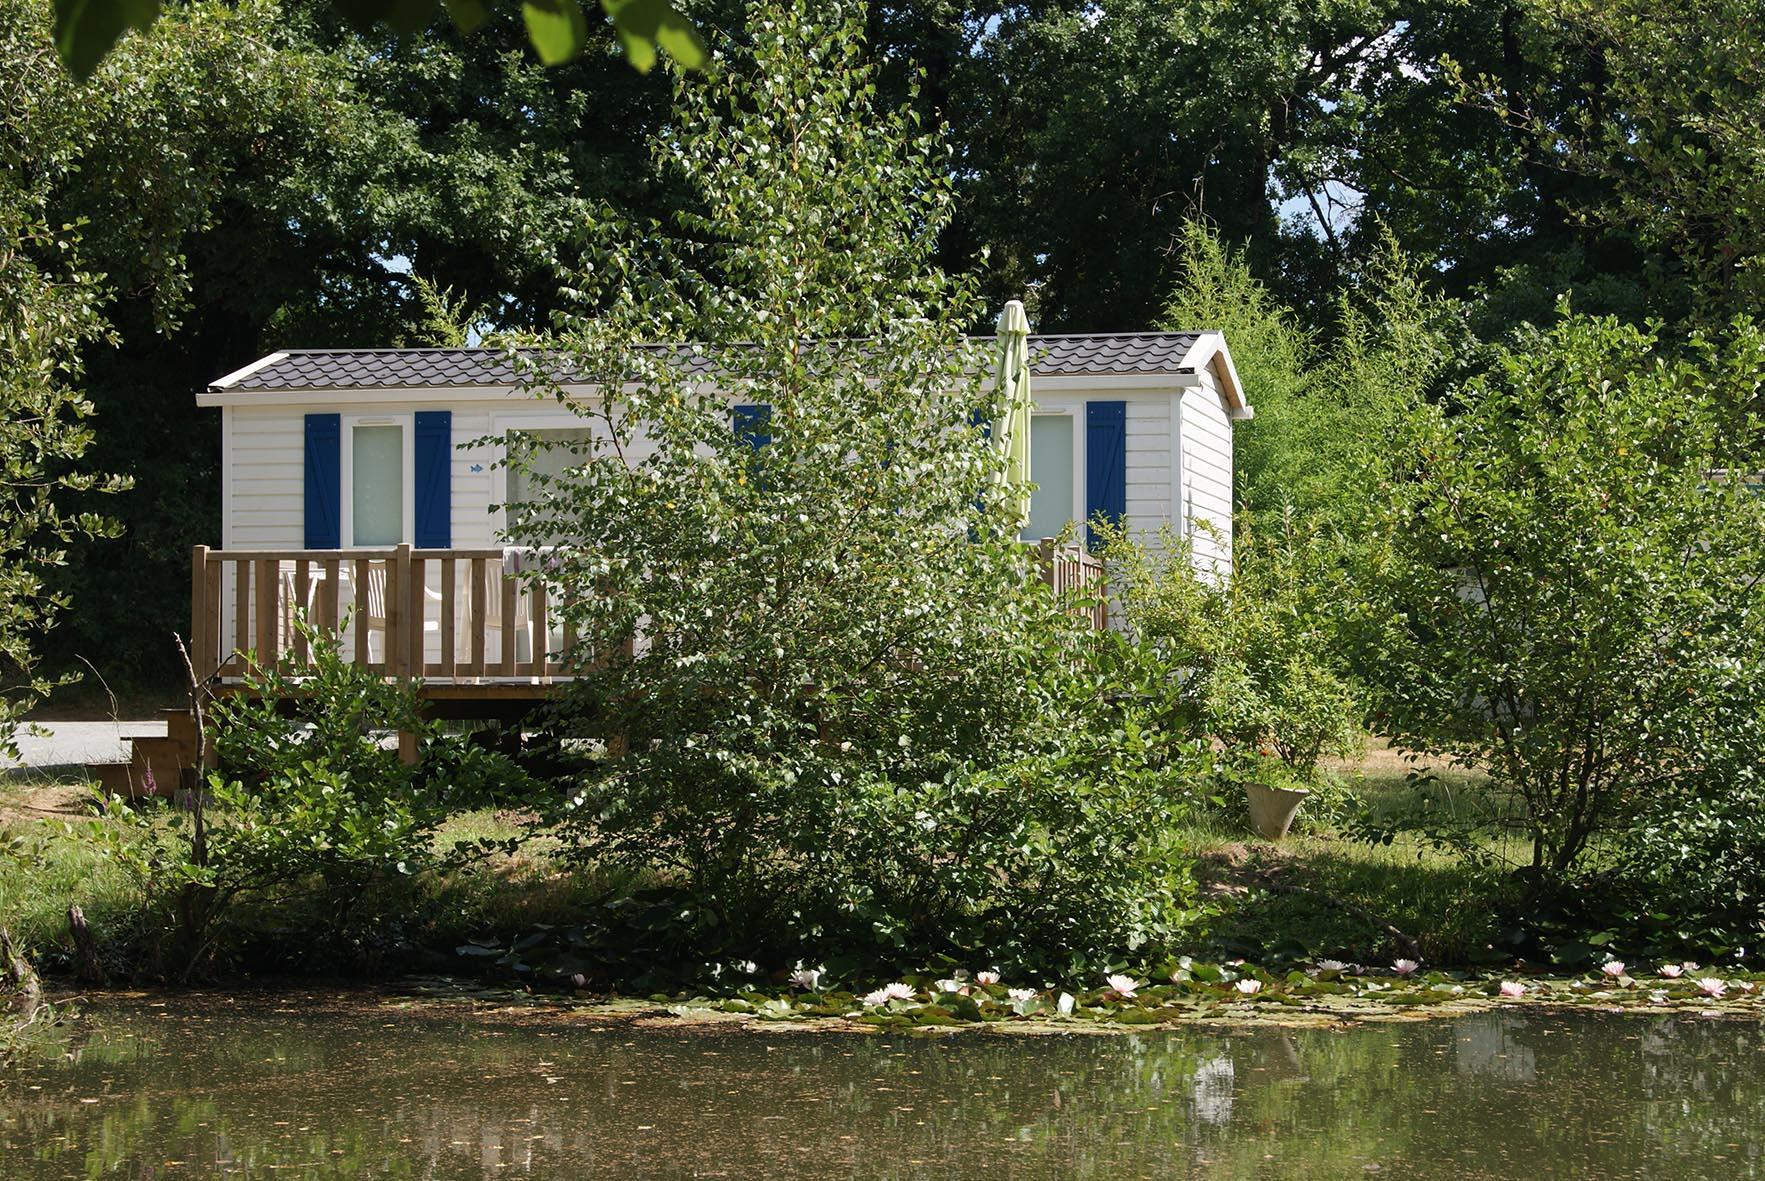 Location - Mobil Home Confort 29M² (2 Chambres) Avec Terrasse - Côté Étang - Camping Les Étangs Mina